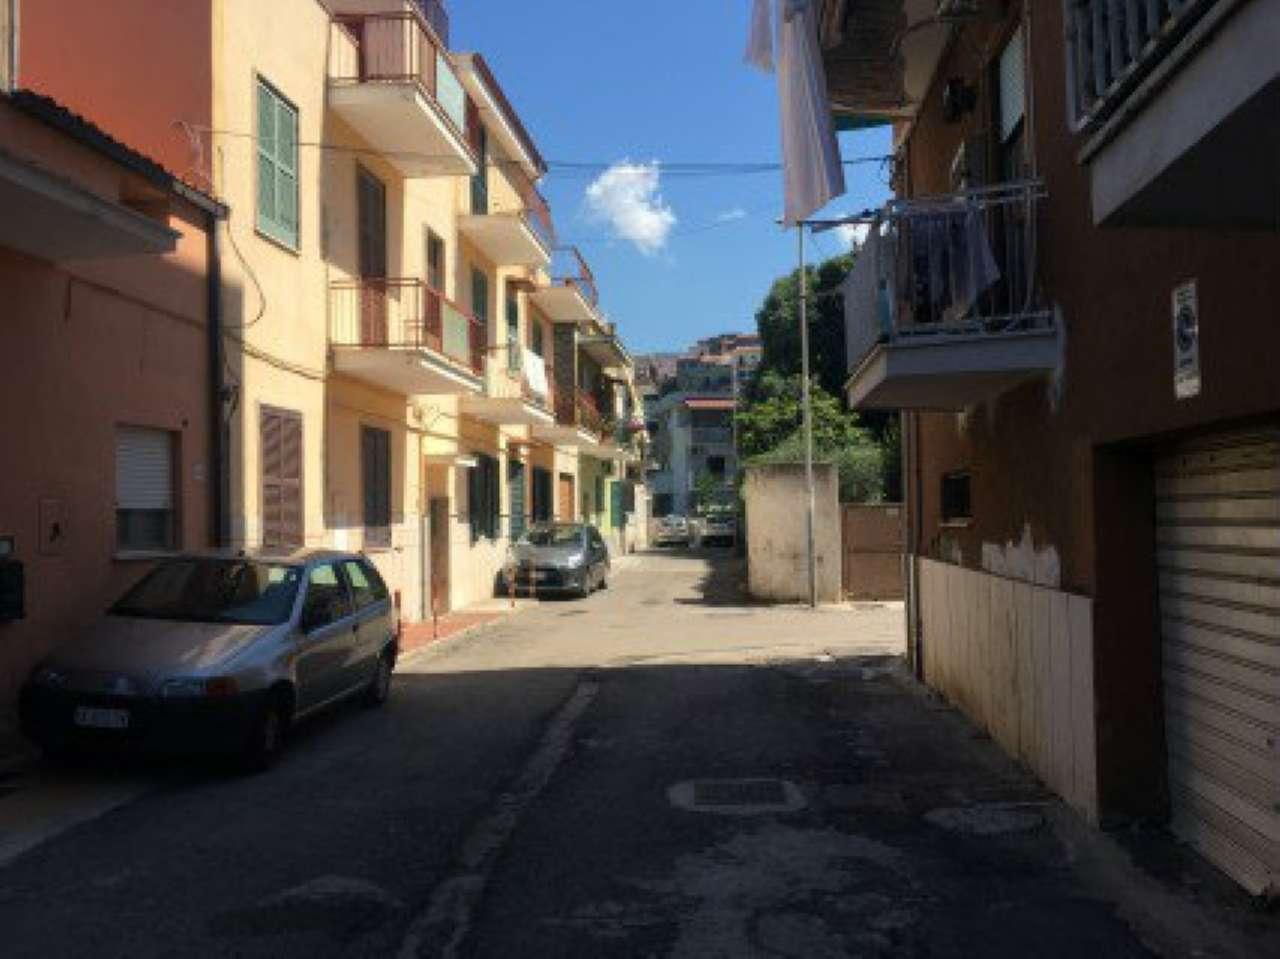 Bilocale, Via Don Morosini, Terracina, foto 18